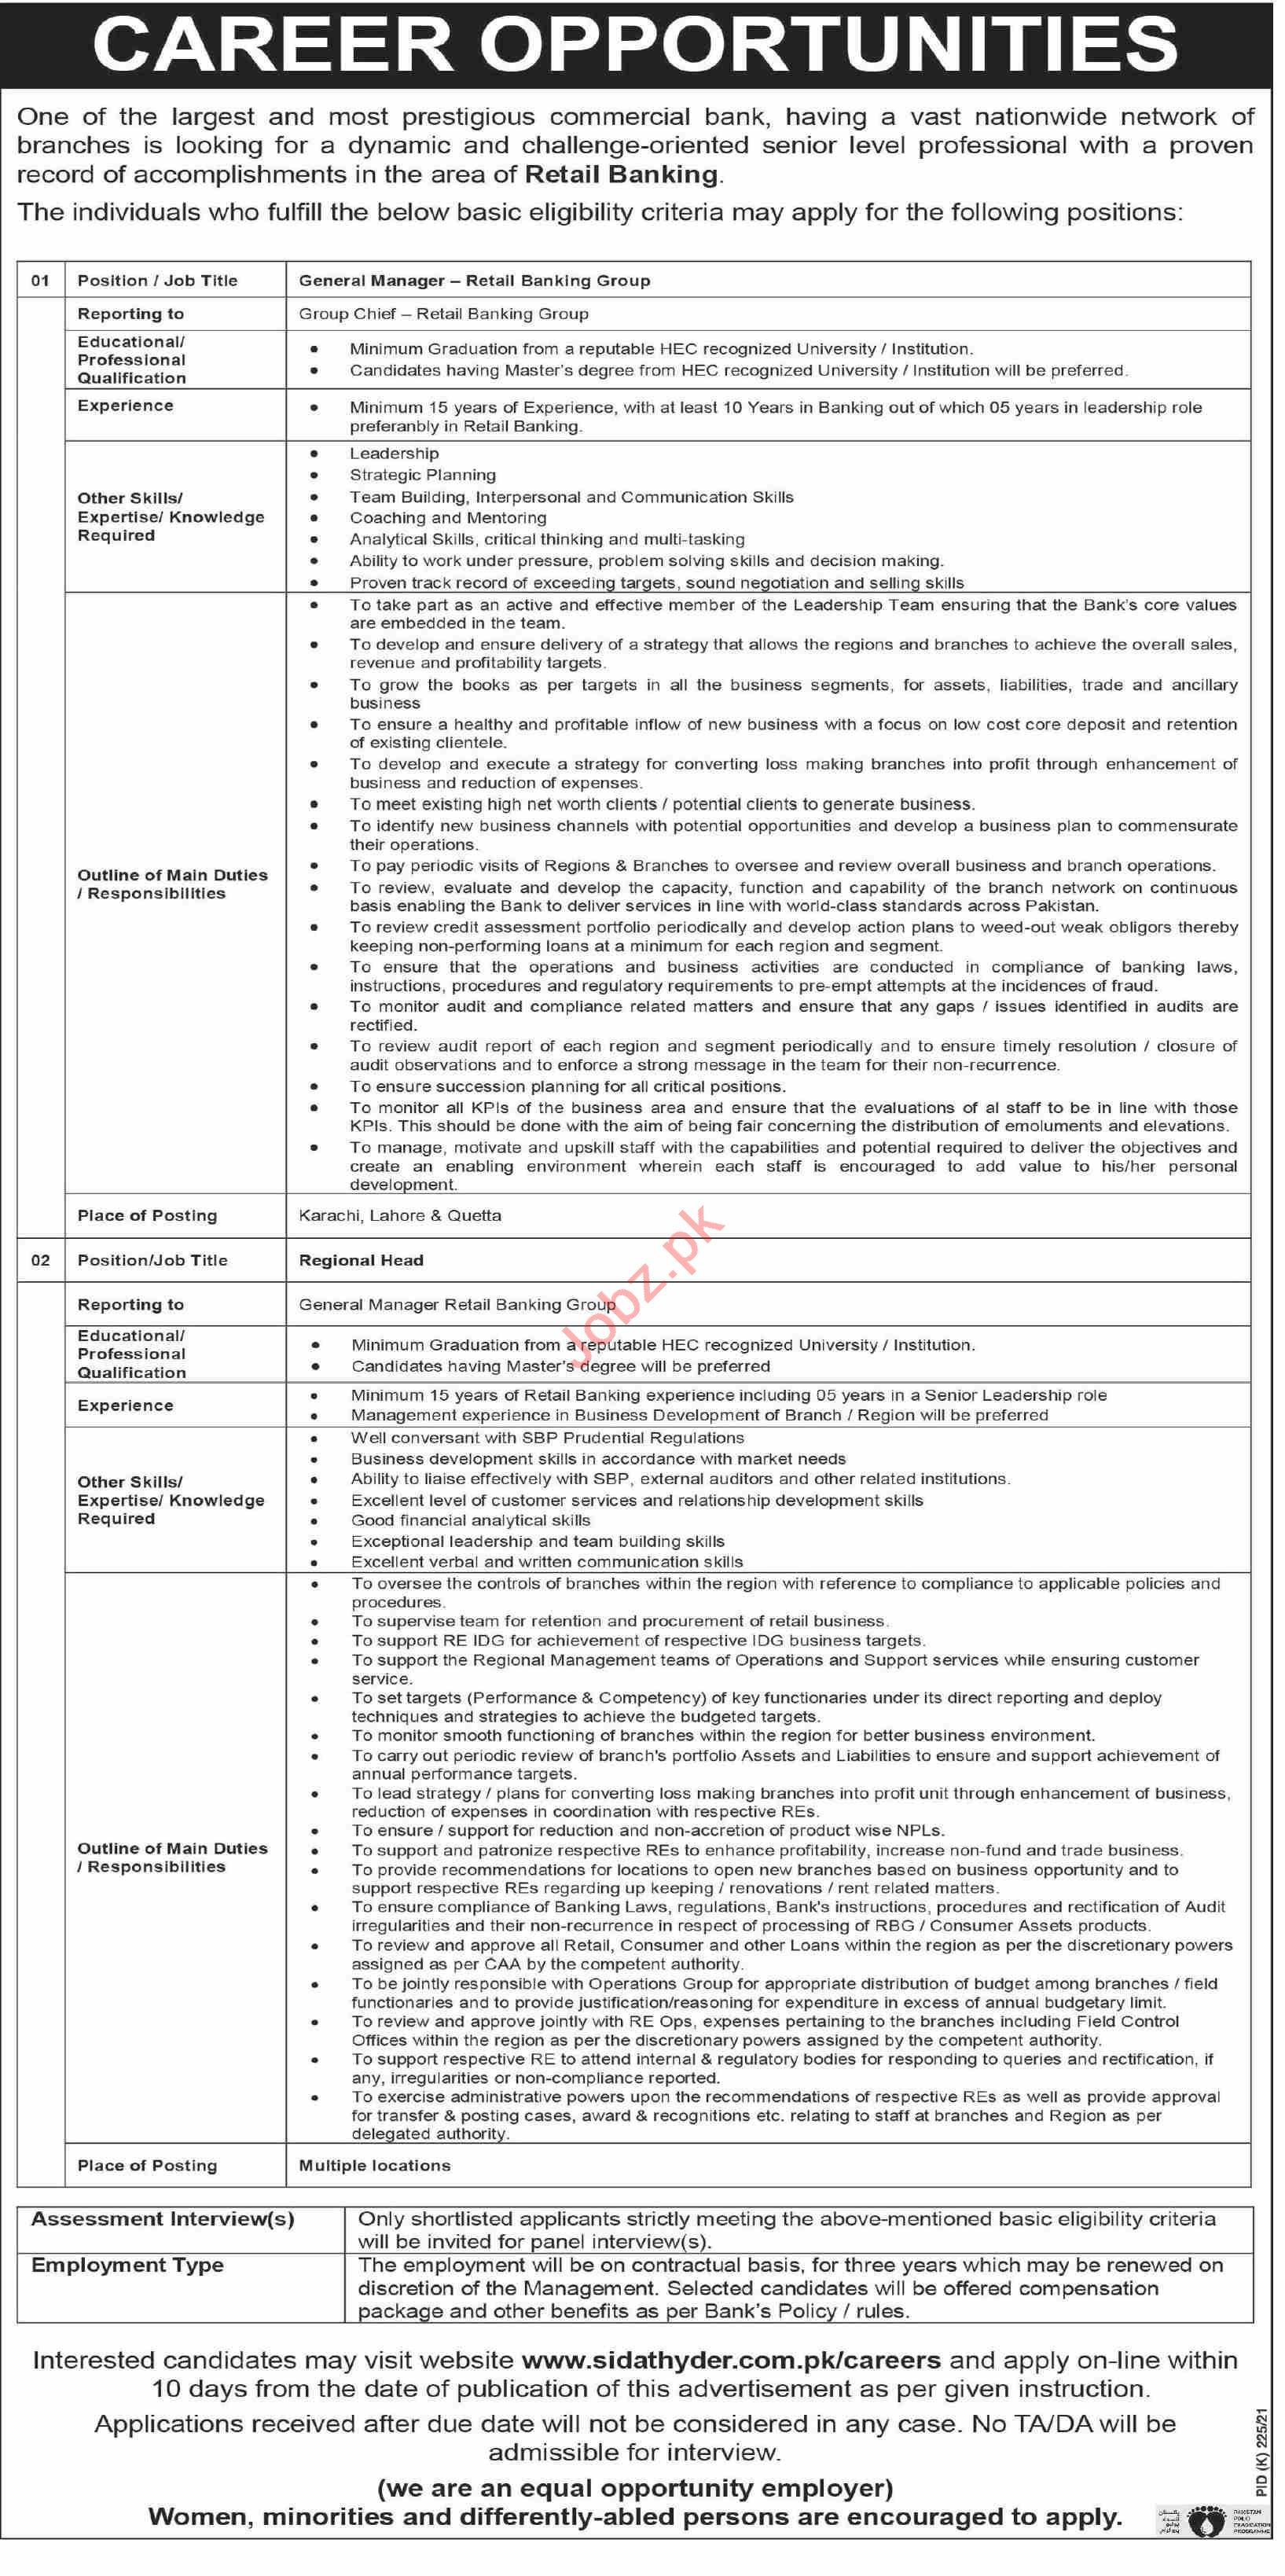 General Manager Retail Banking Group Jobs 2021 in Karachi